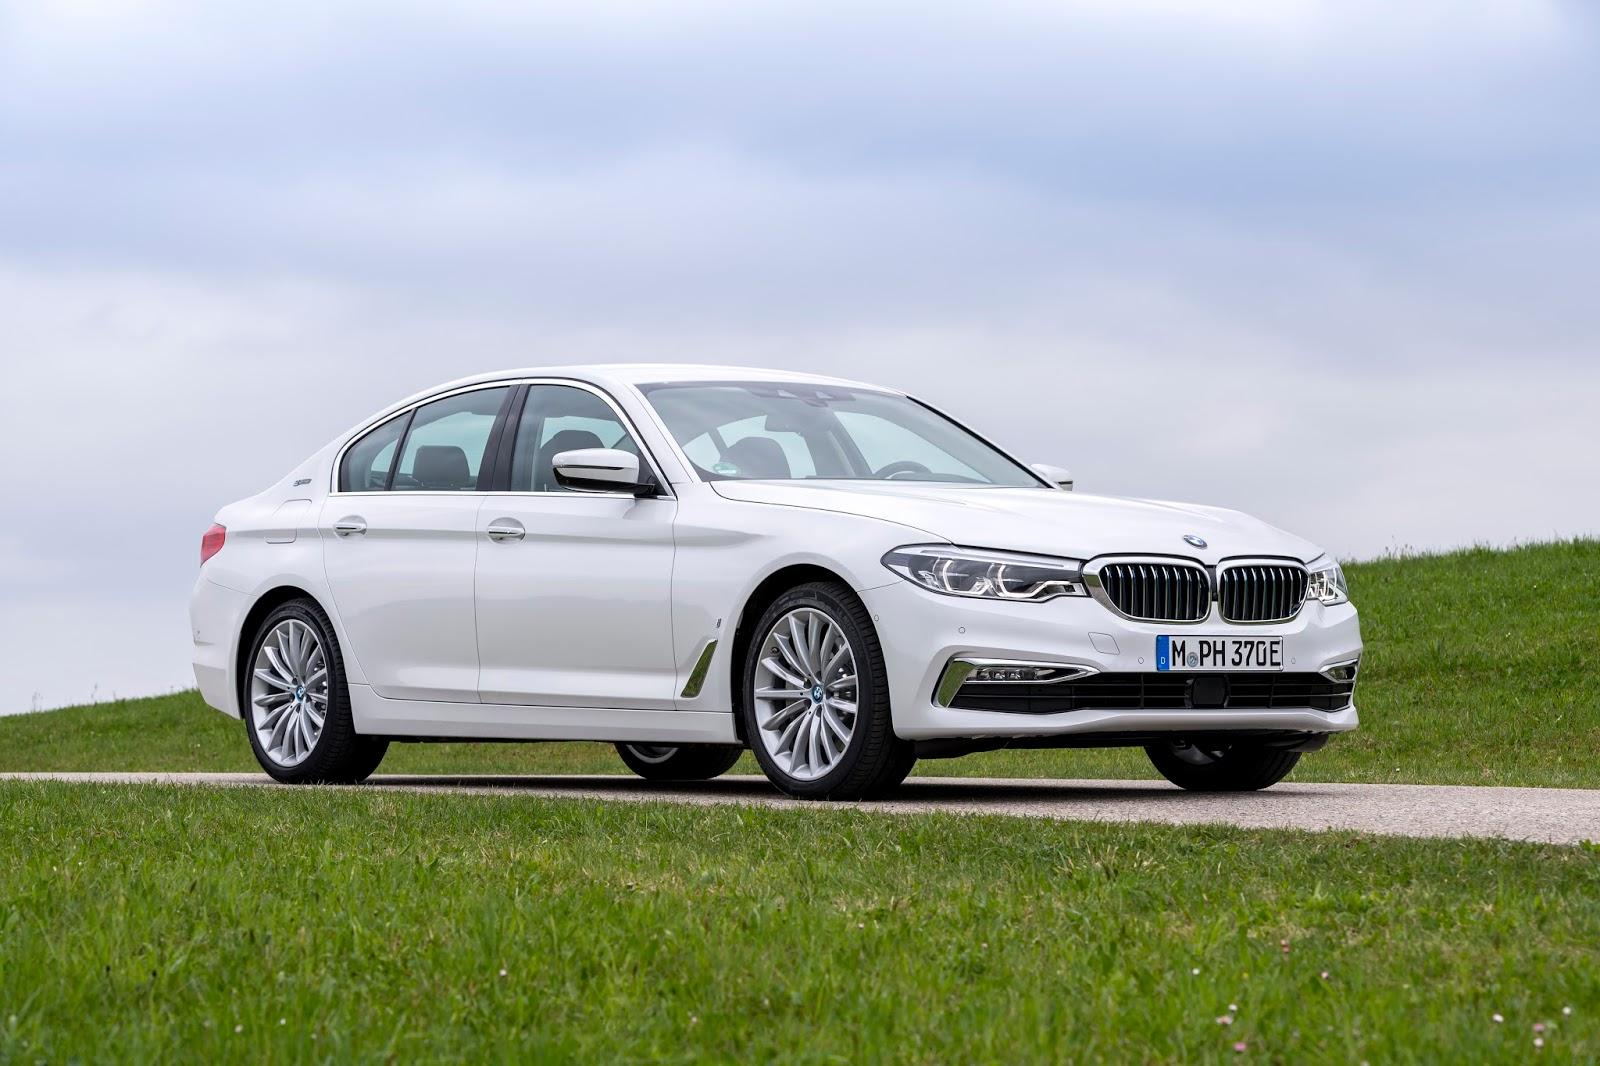 P90256367 highRes the new bmw 530e ipe Η BMW 530e iPerformance φέρνει την ηλεκτρική επανάσταση BMW, BMW 5, BMW 530e iPerformance, Electric cars, Hybrid, Λανσάρισμα